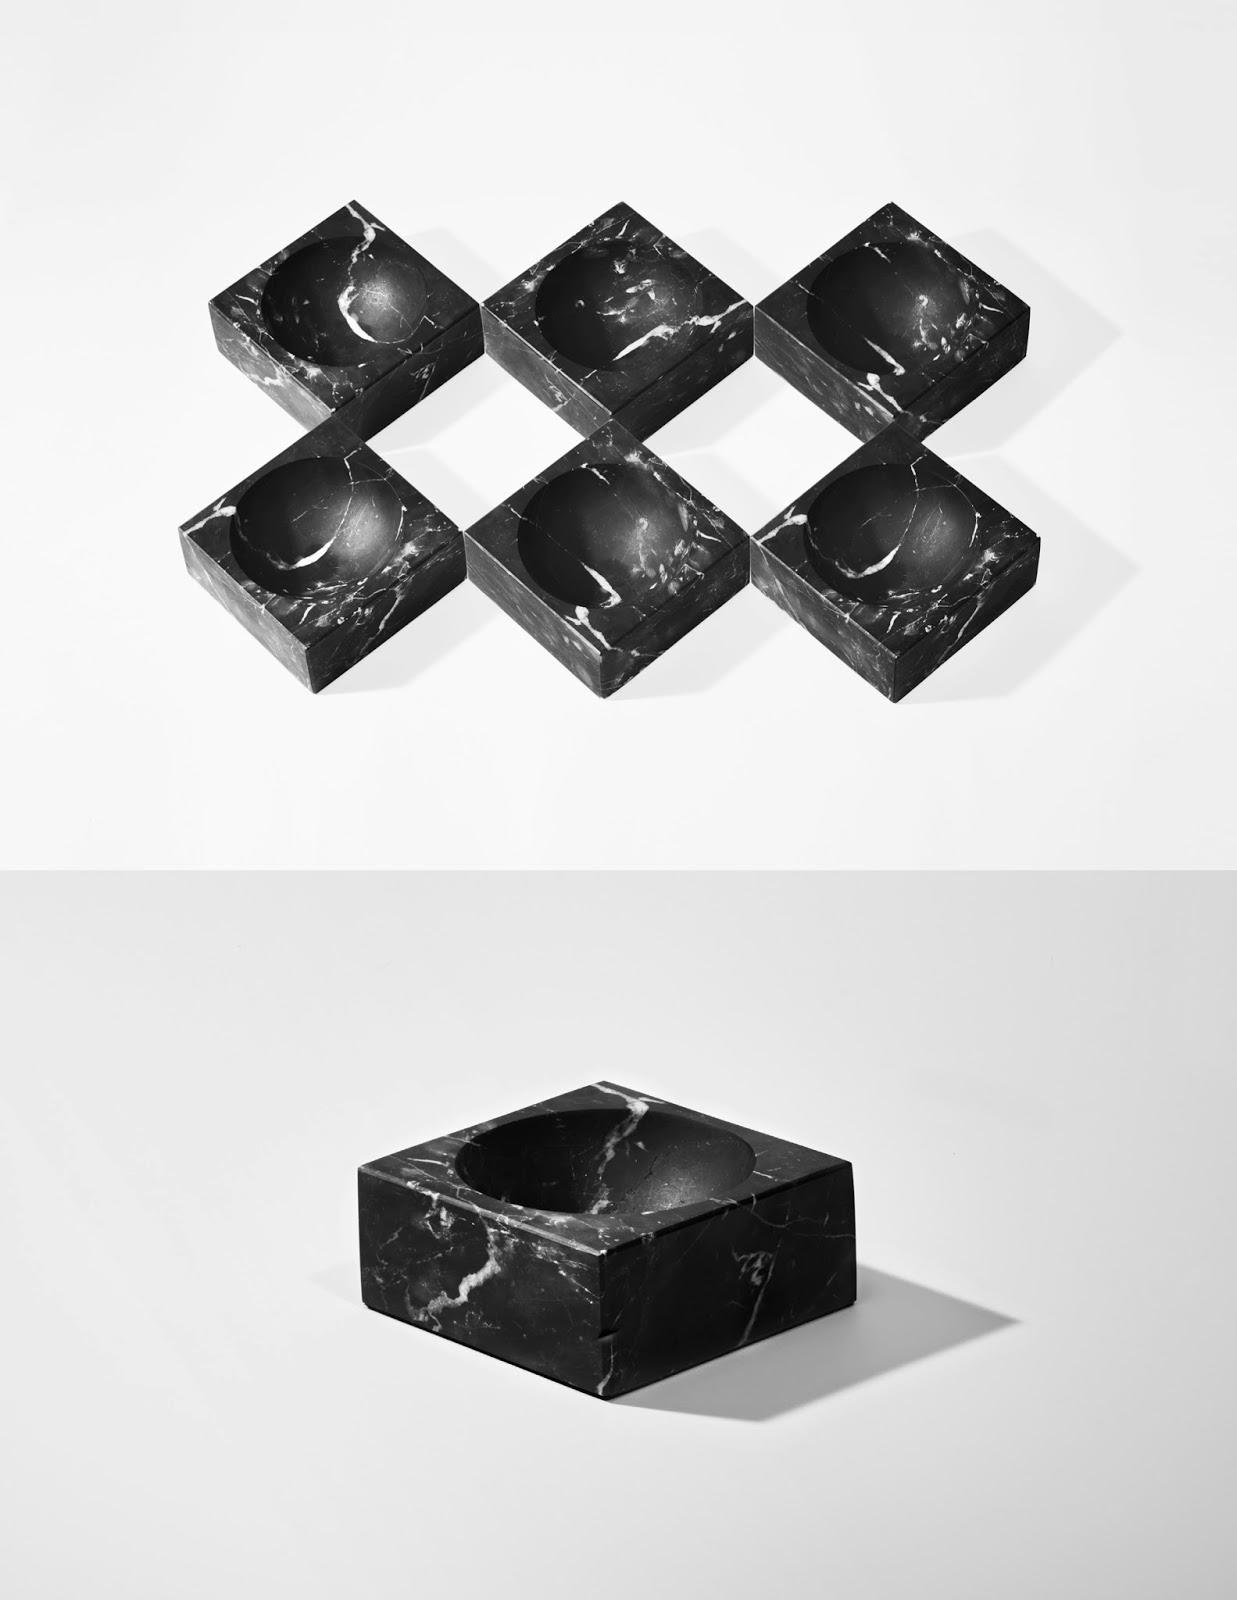 Hong Kong Fashion Geek Alexander Wang Objects Pop Up